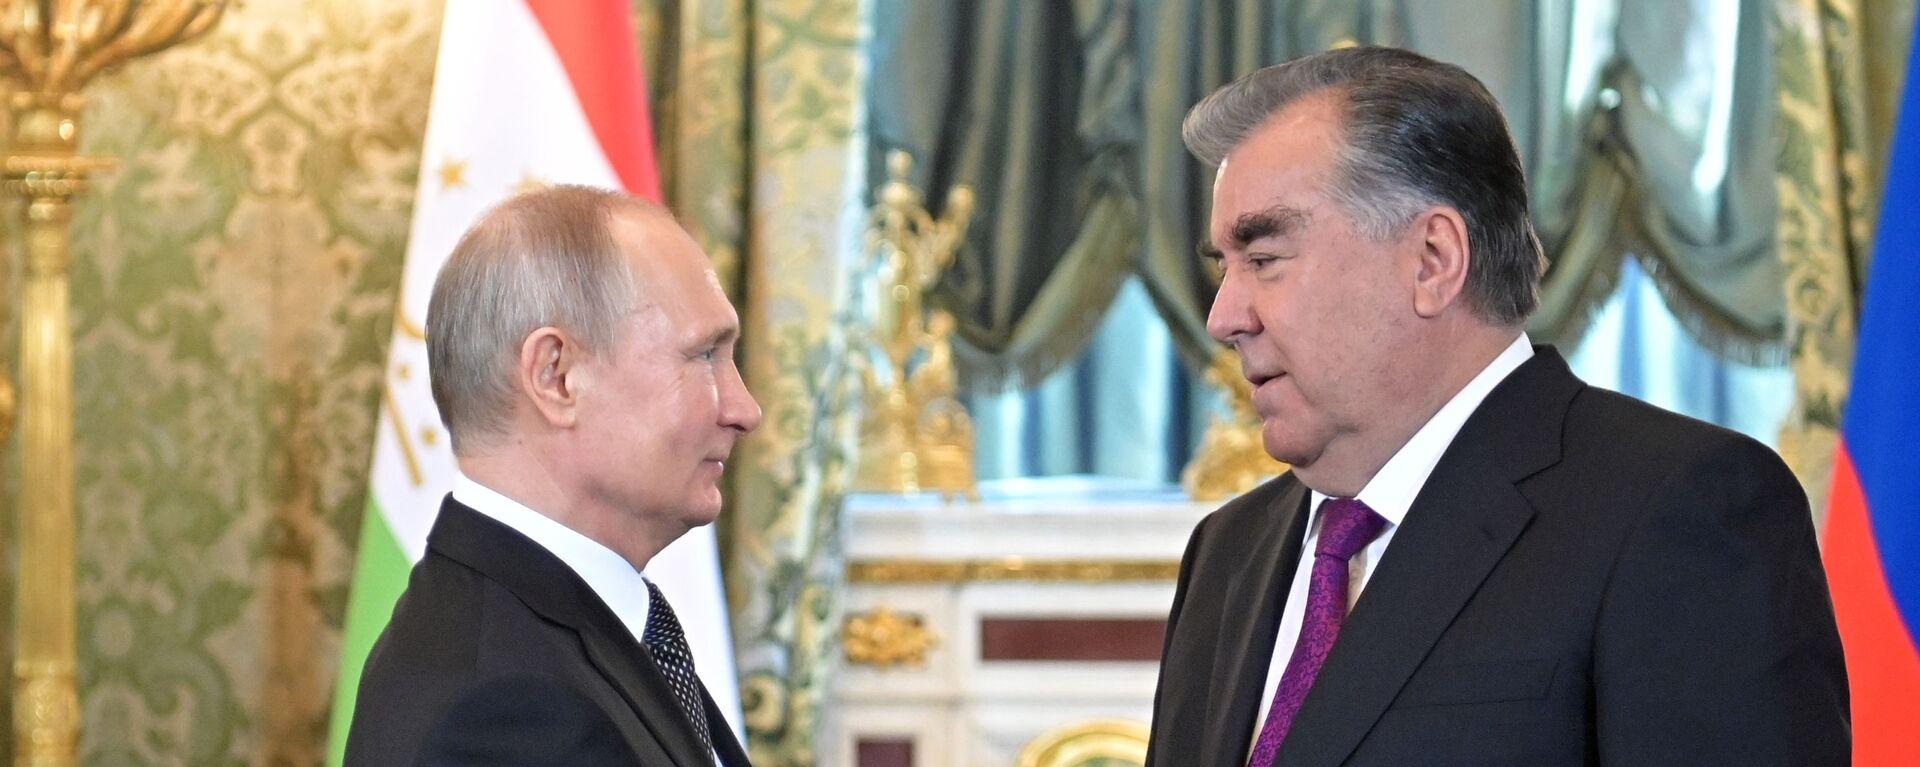 Президент РФ В. Путин встретился с президентом Таджикистана Э. Рахмон - Sputnik Таджикистан, 1920, 18.08.2021